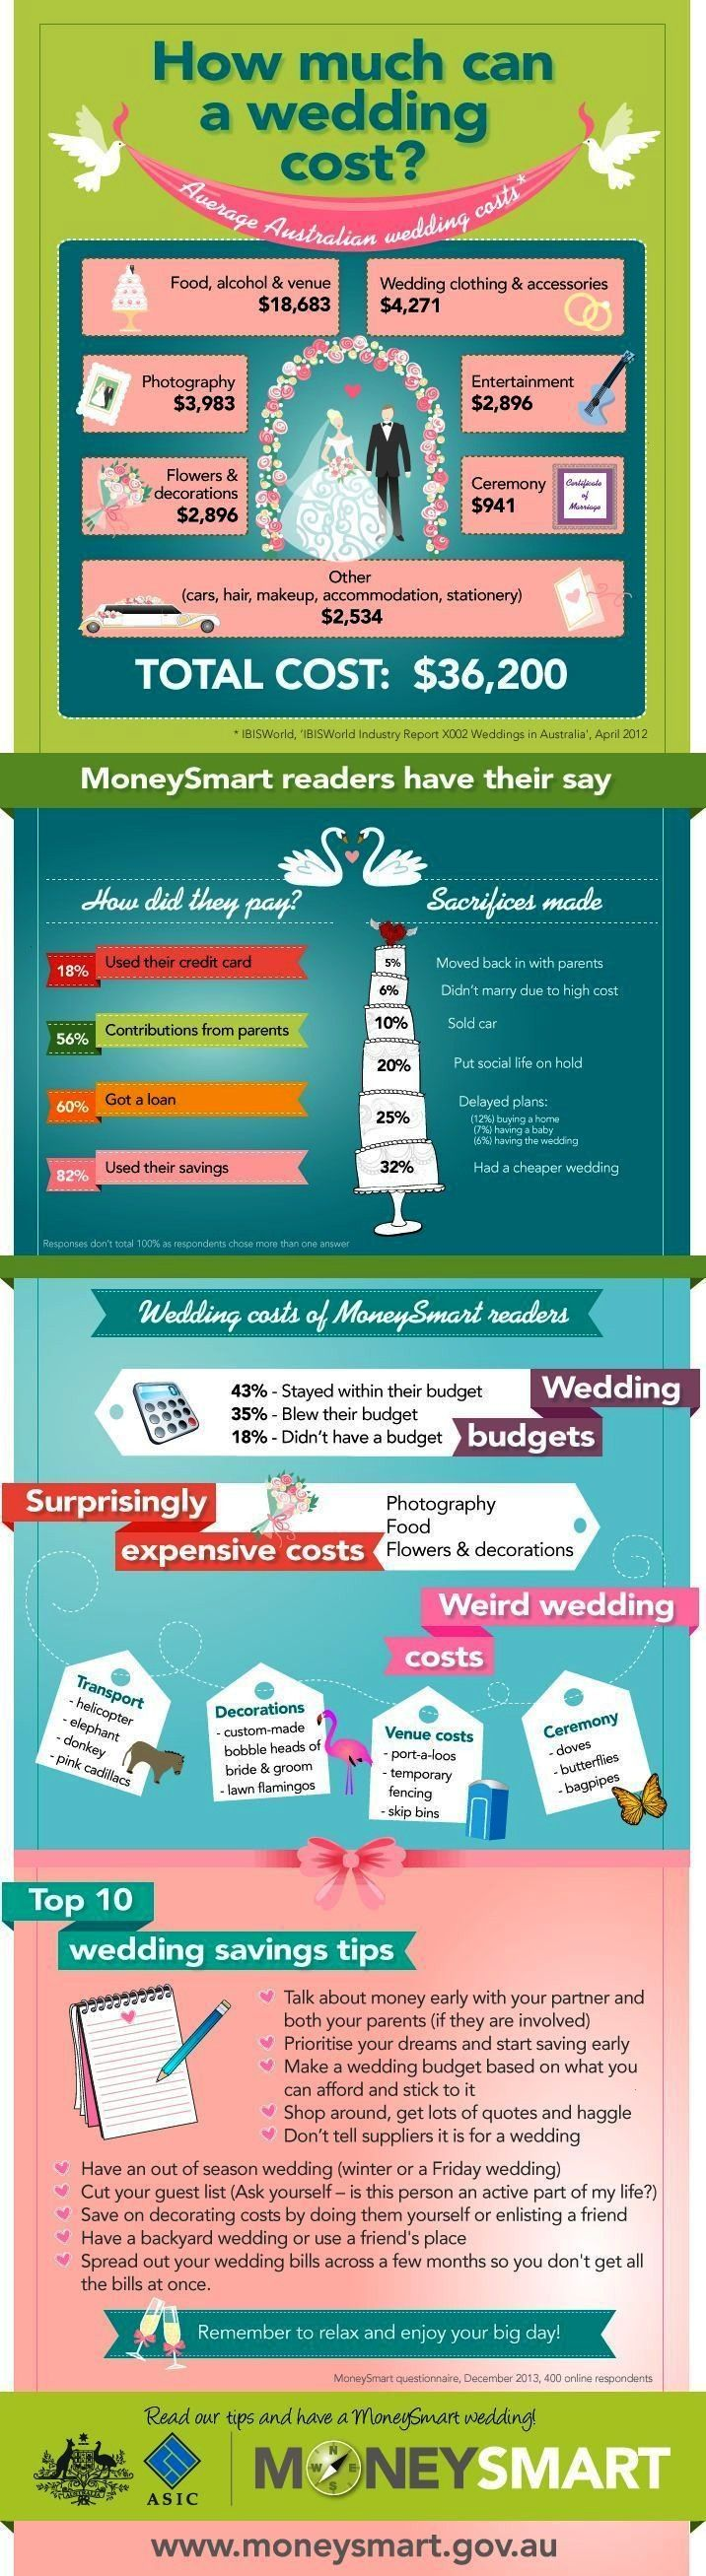 weddingplanninginfographics weddingplanning infographic